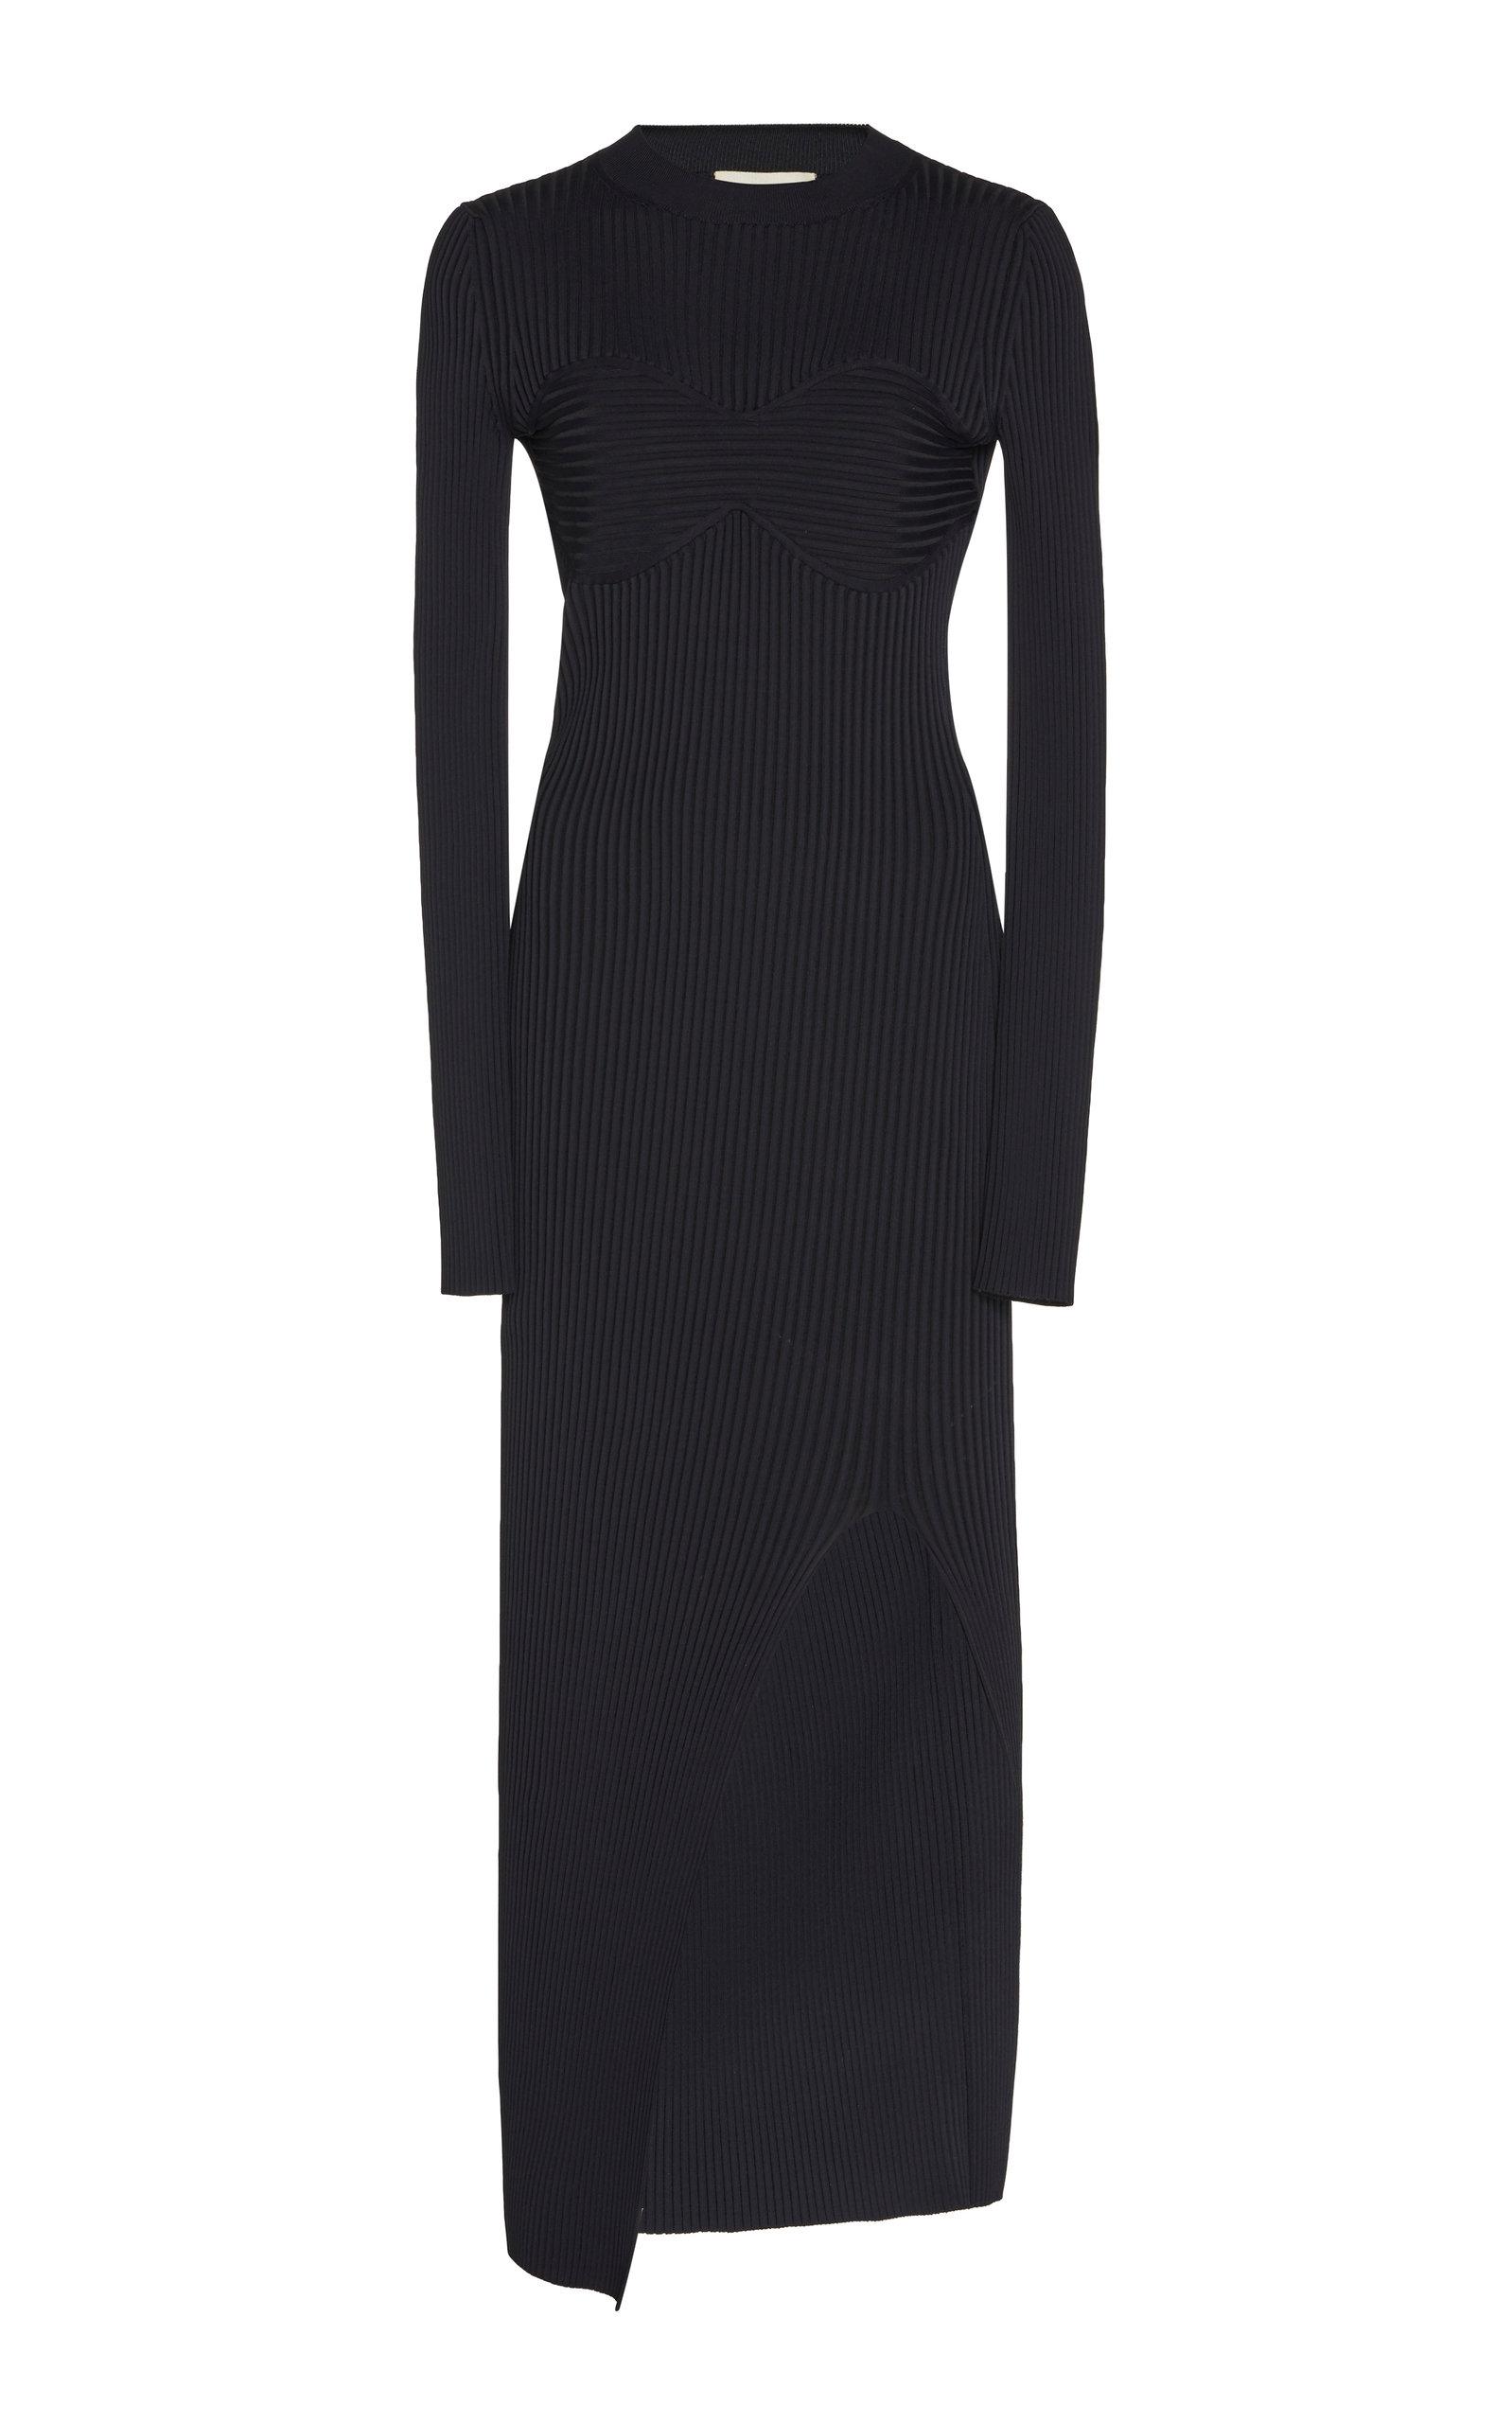 Buy Khaite Evlynne Ribbed-Knit Cotton Dress online, shop Khaite at the best price